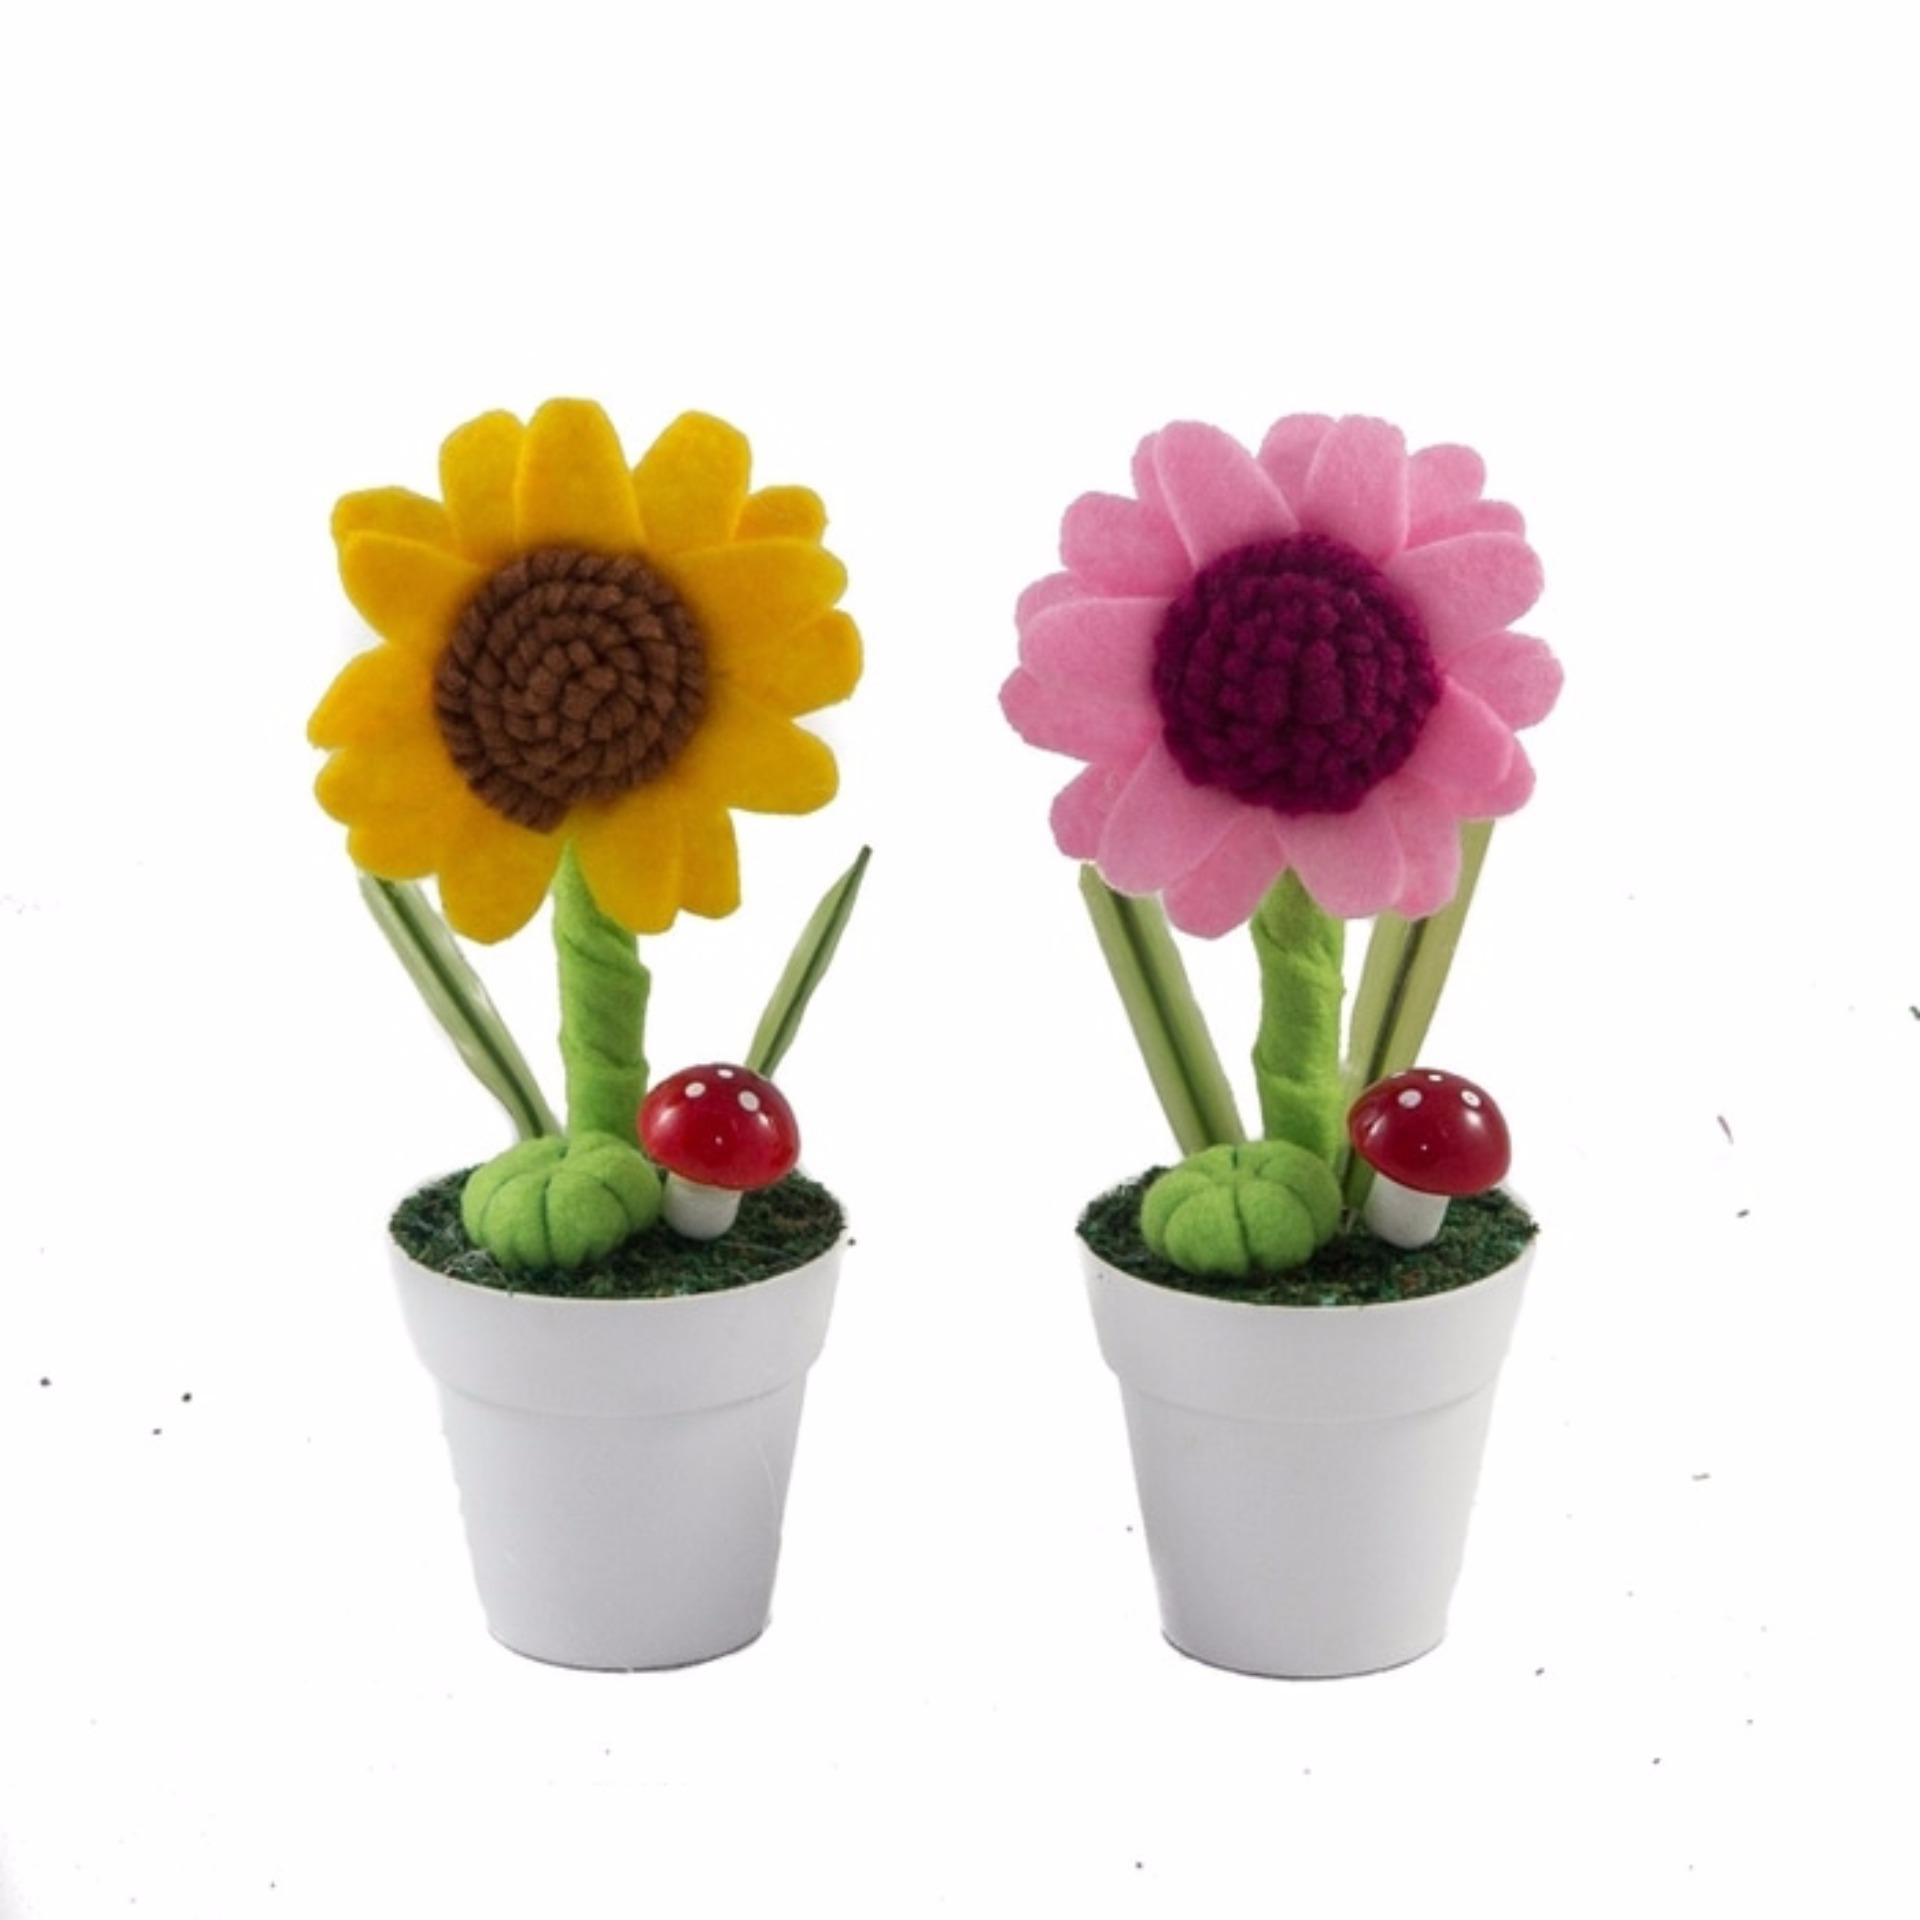 Buket Bunga Matahari Flanel Vas Plastik Putih